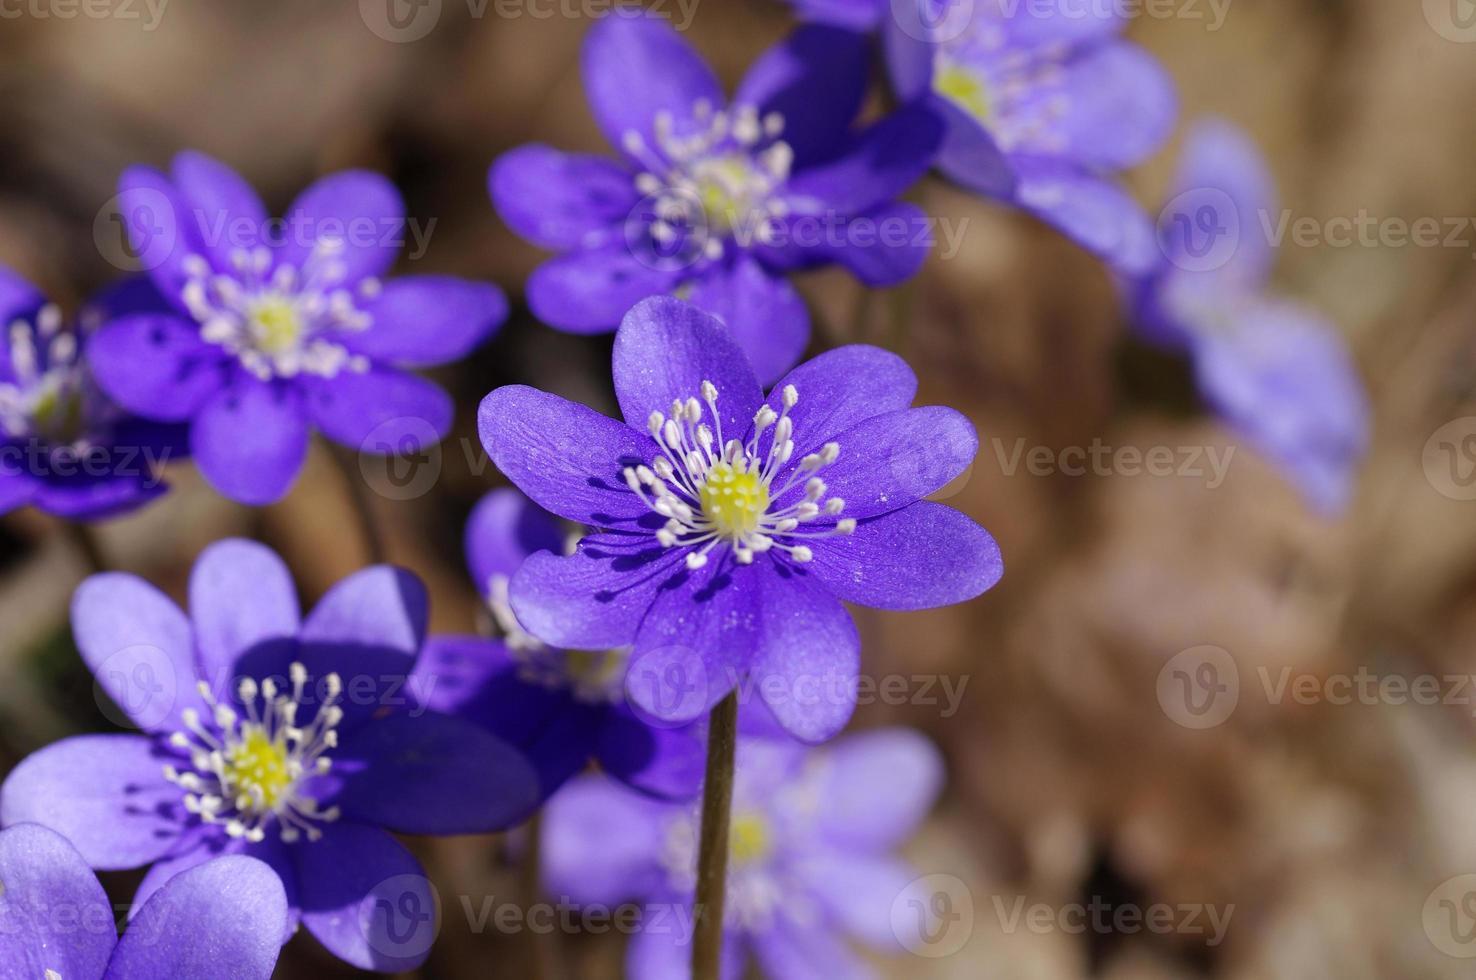 eerste lente blauwe bloemen, viooltjes in bos foto